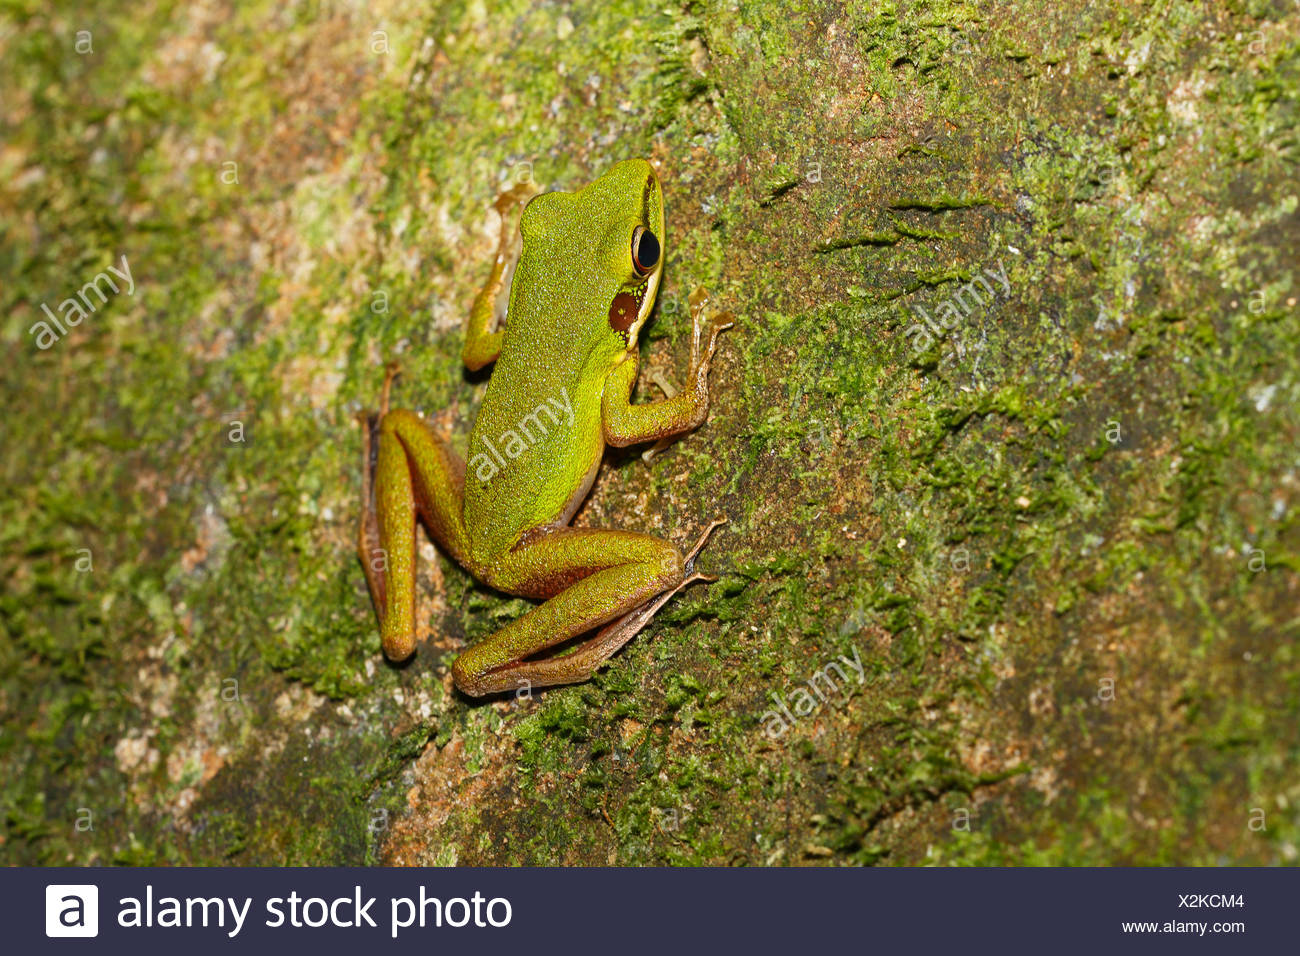 White-lipped frog (Rana chalconota), true frog in the tropical rainforest, Sarawak, Borneo, Malaysia - Stock Image